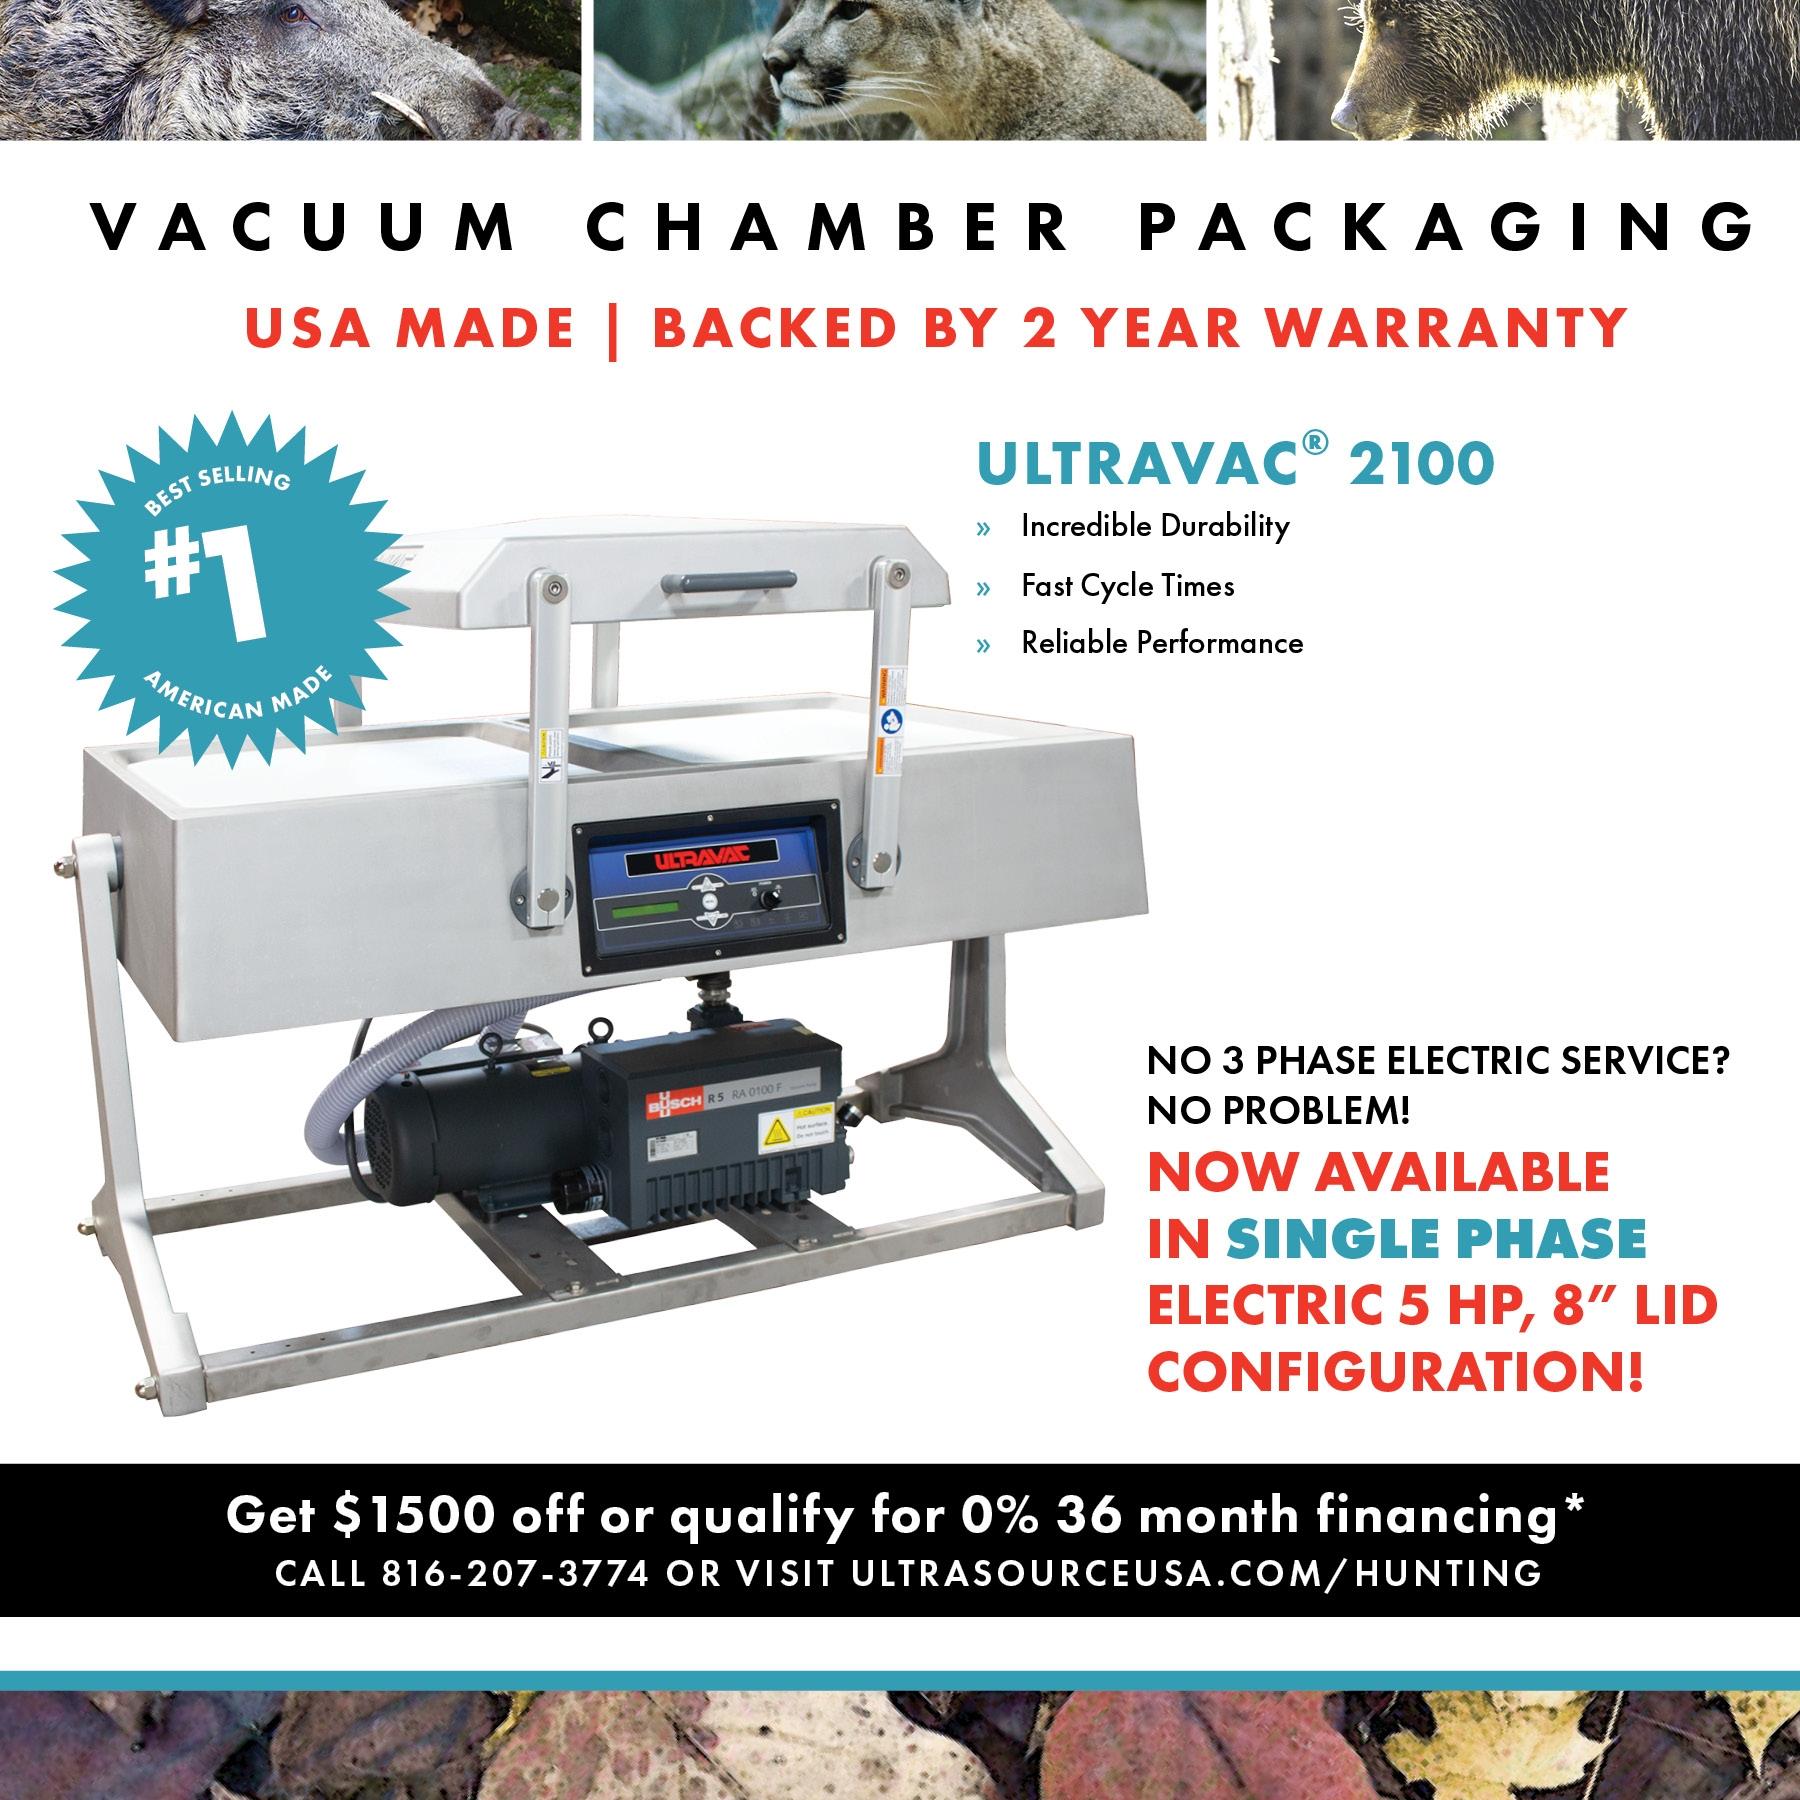 Ultravac 2100 Double Chamber Vacuum Sealer